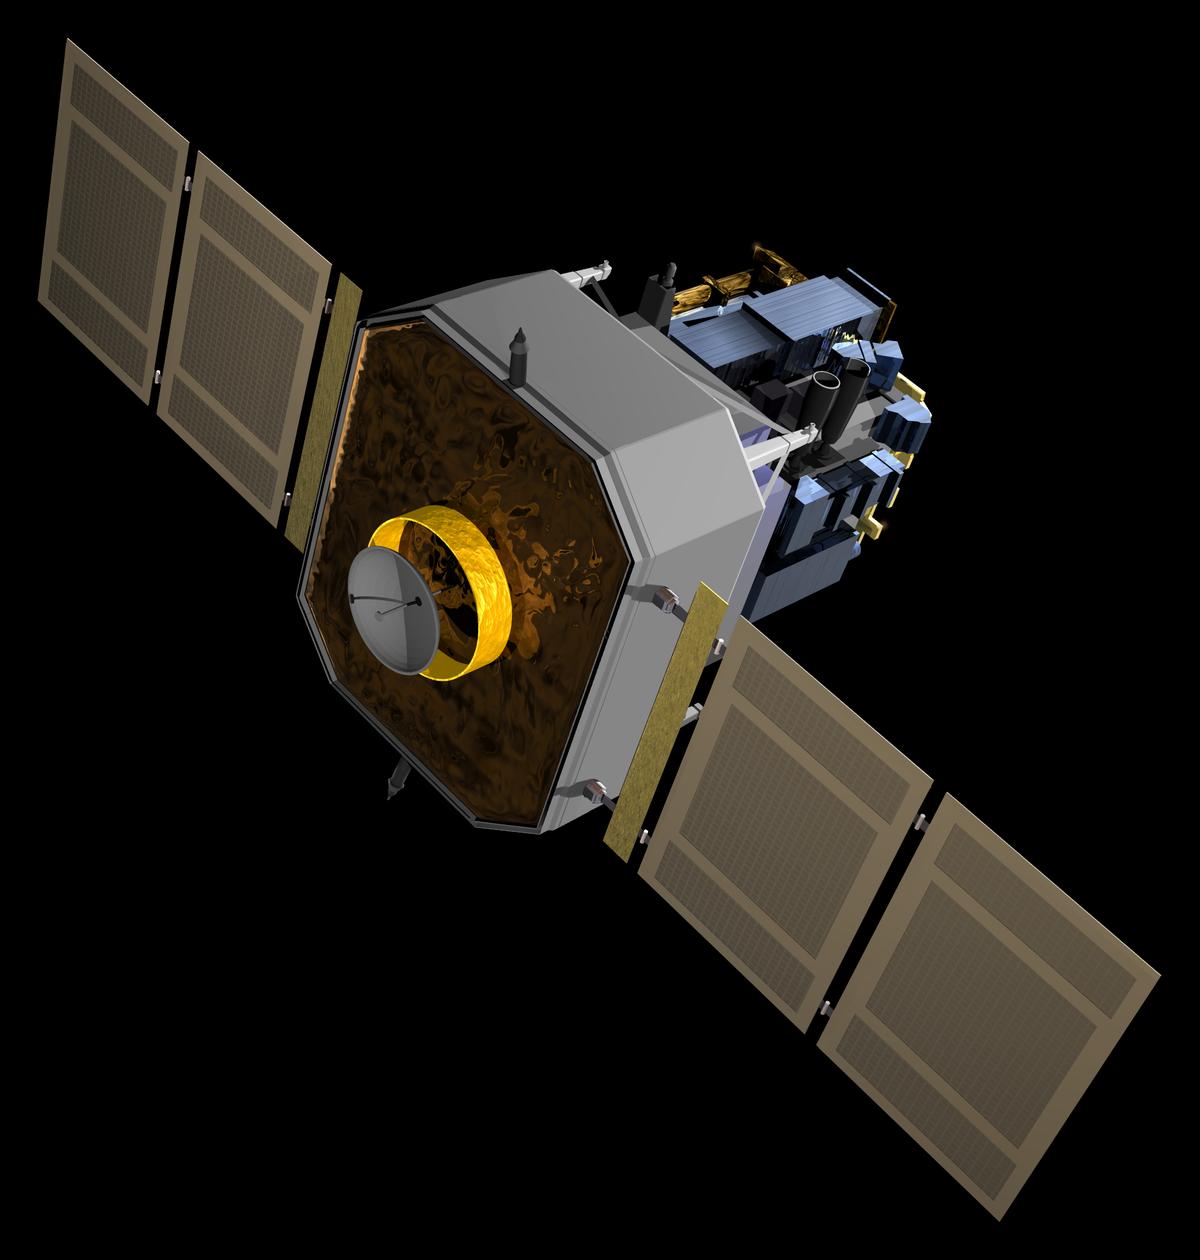 spacecraft uses - photo #5